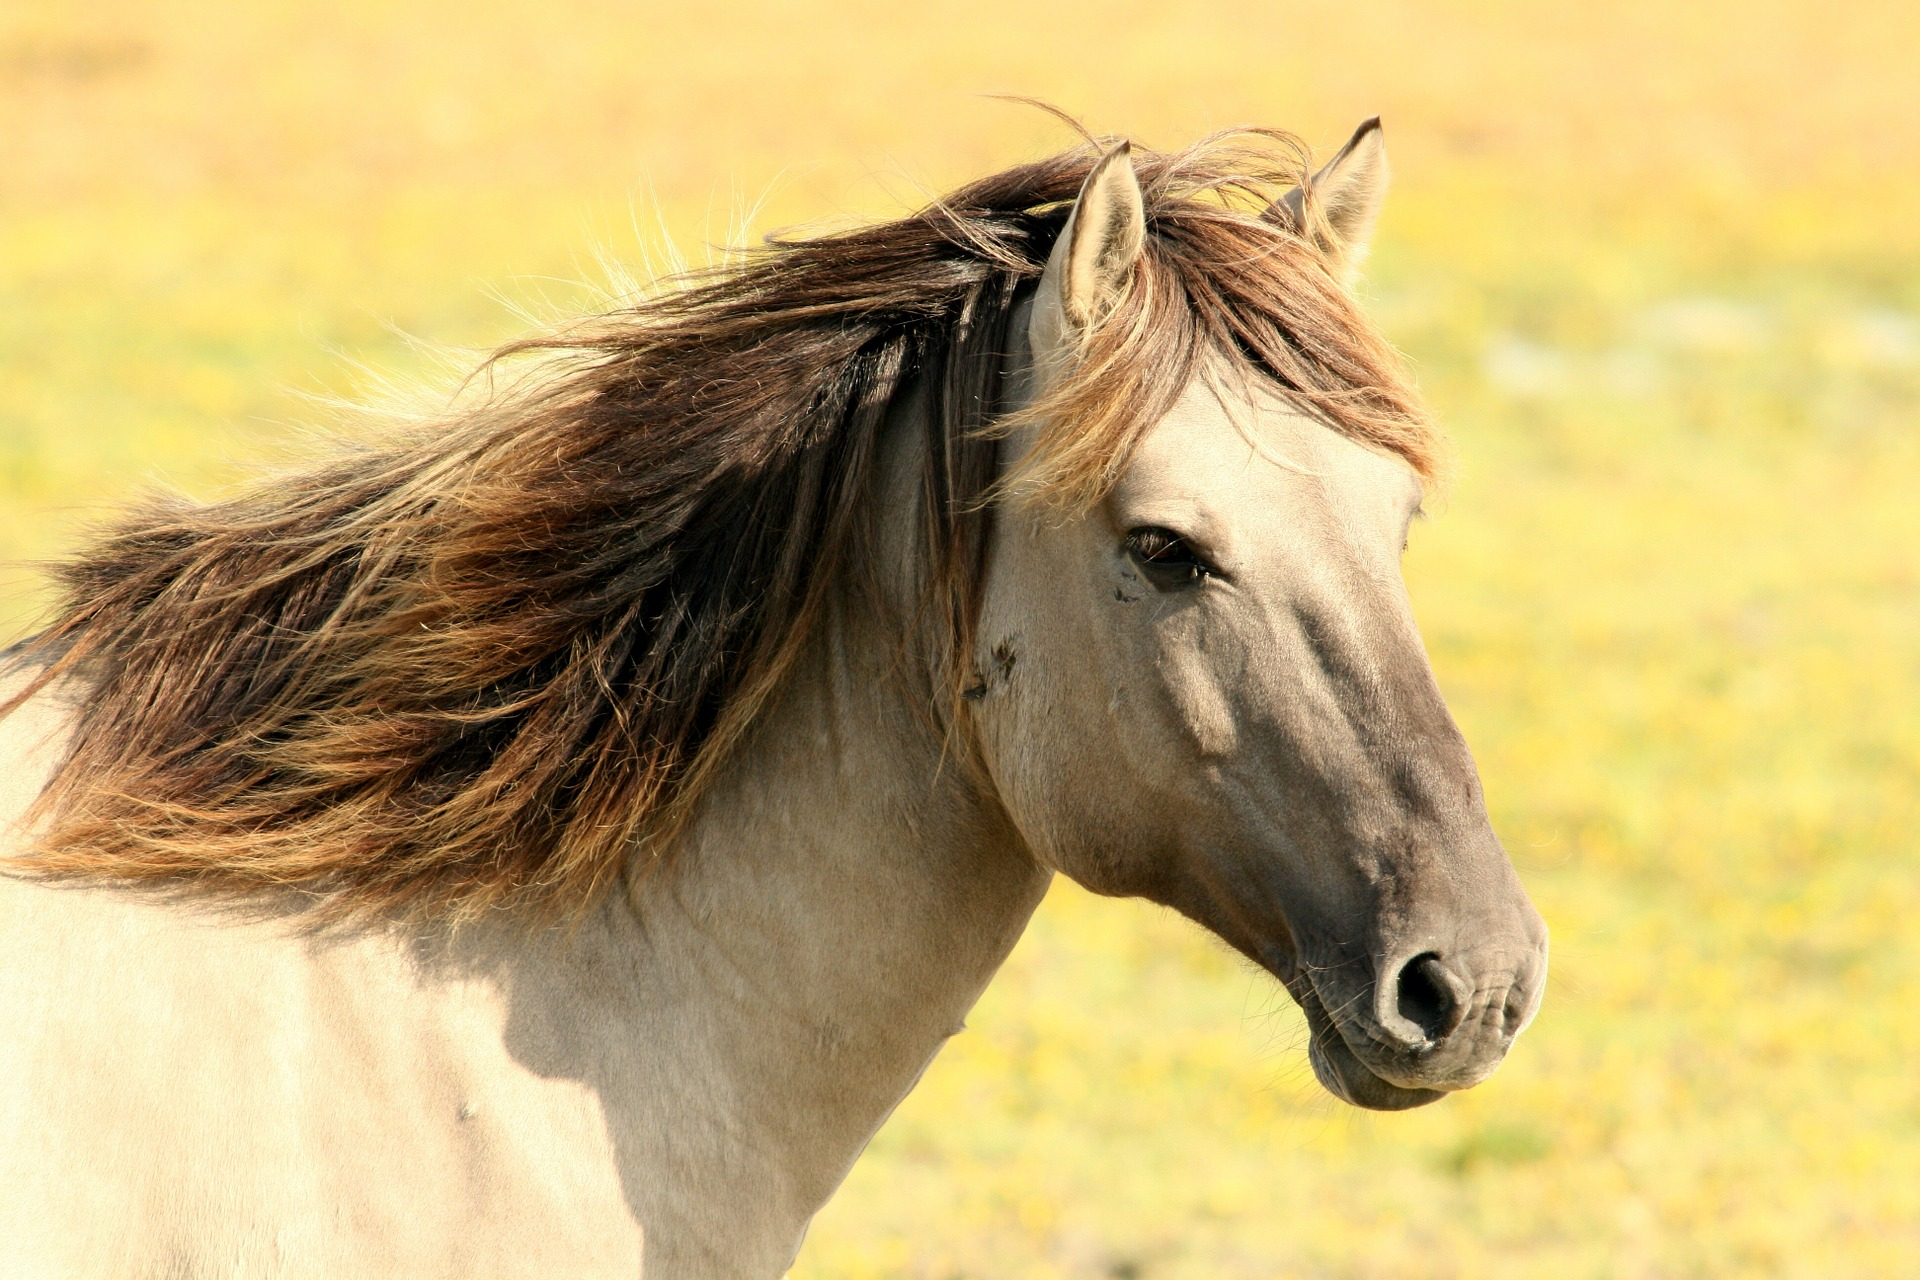 horse-197199_1920